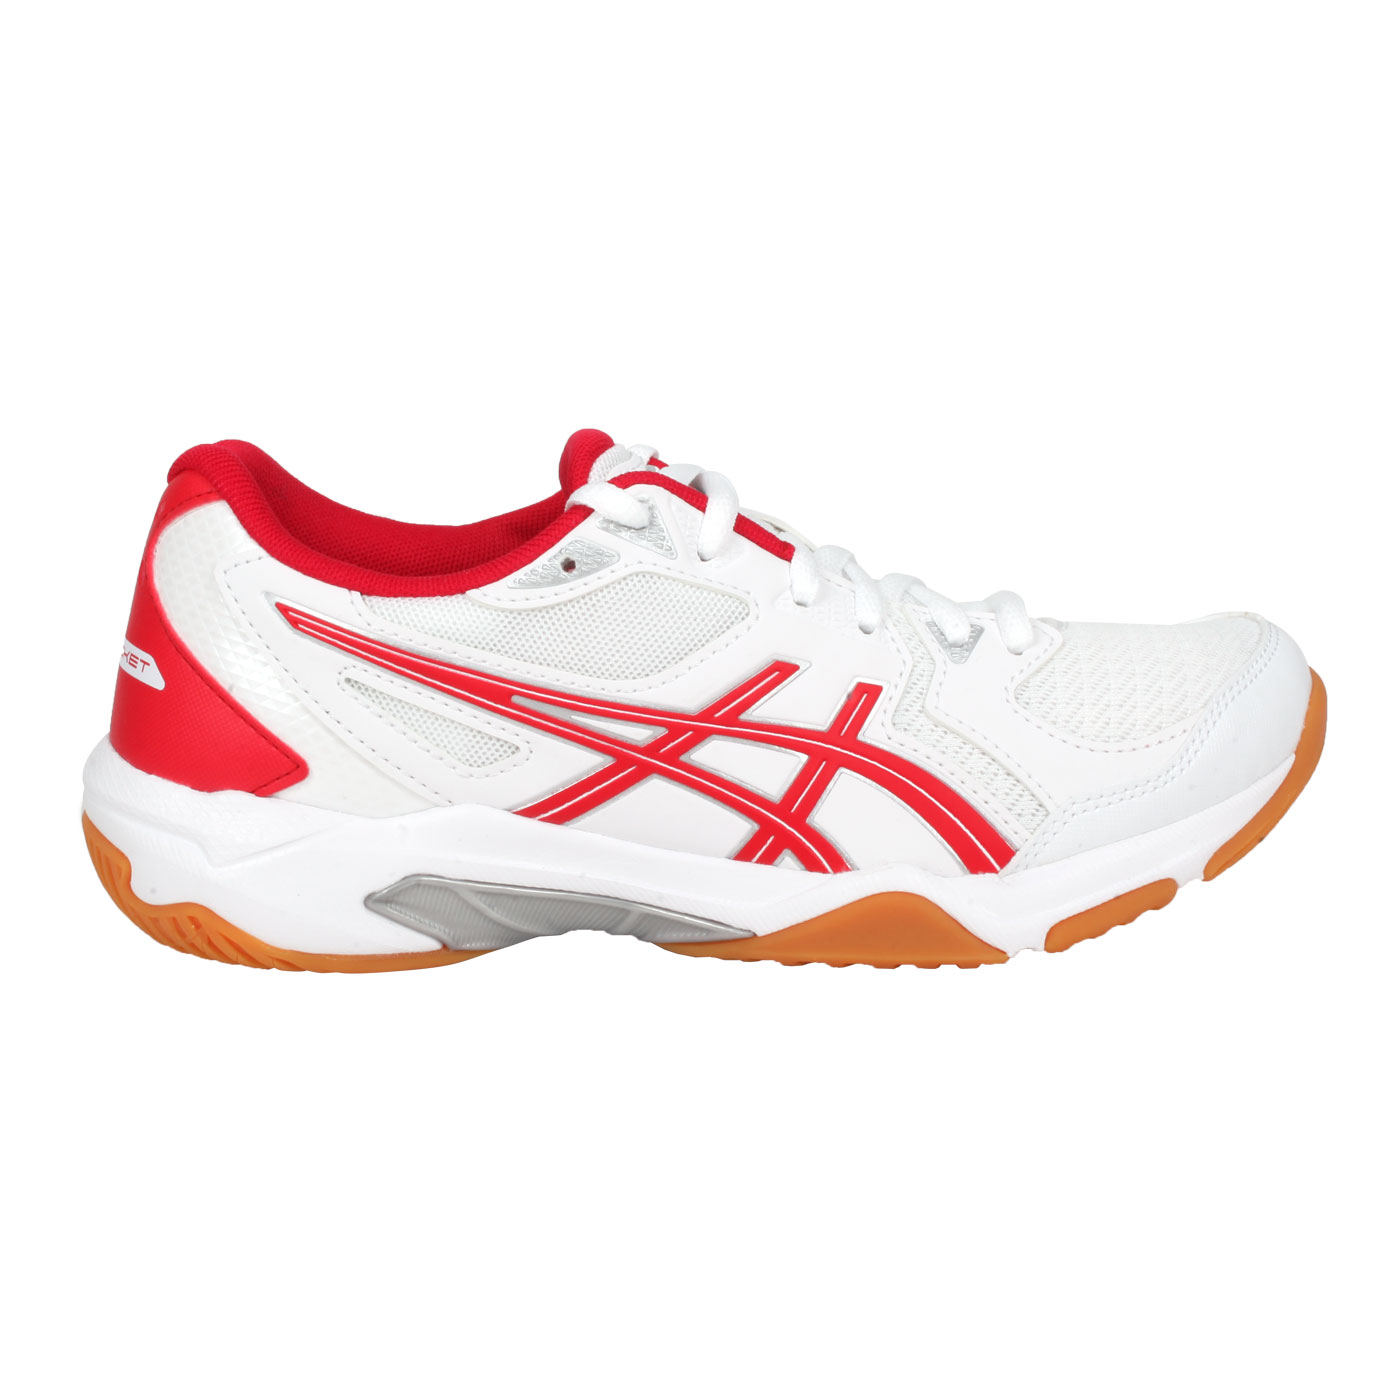 ASICS 女款排羽球鞋  @GEL-ROCKET 10@1072A056-100 - 白紅